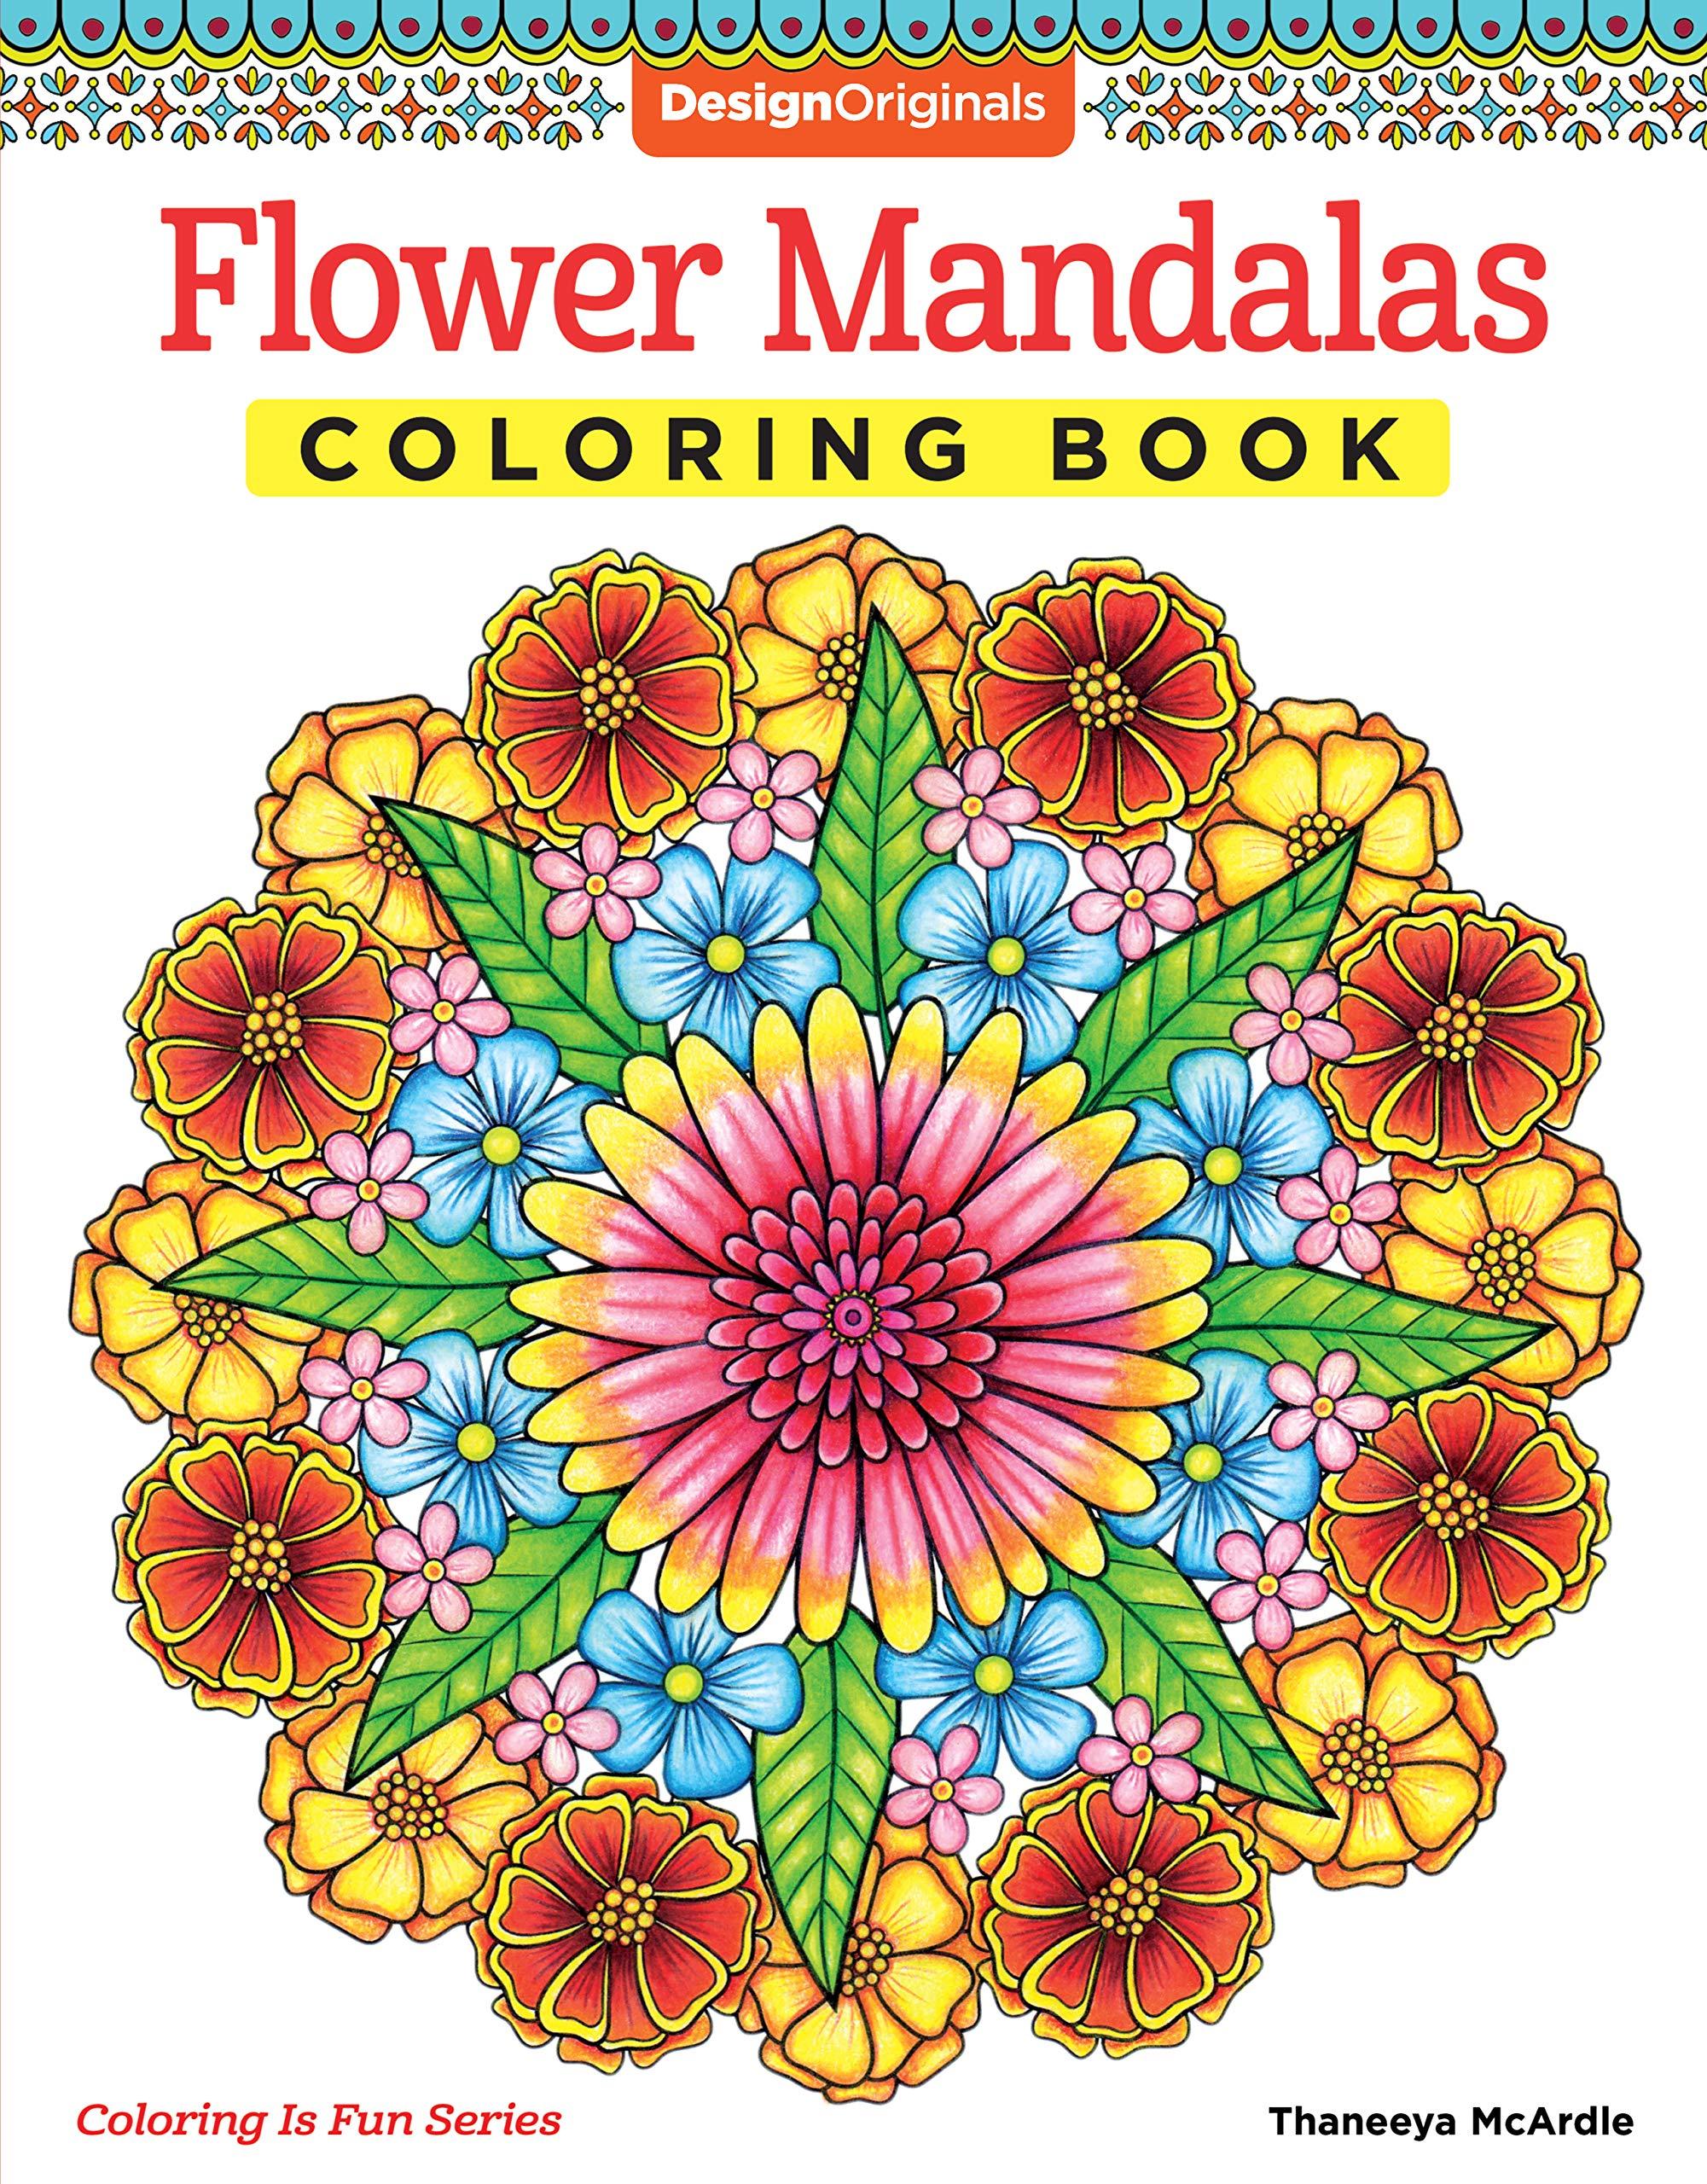 Amazon.com Flower Mandalas Coloring Book Design Originals 18 ...